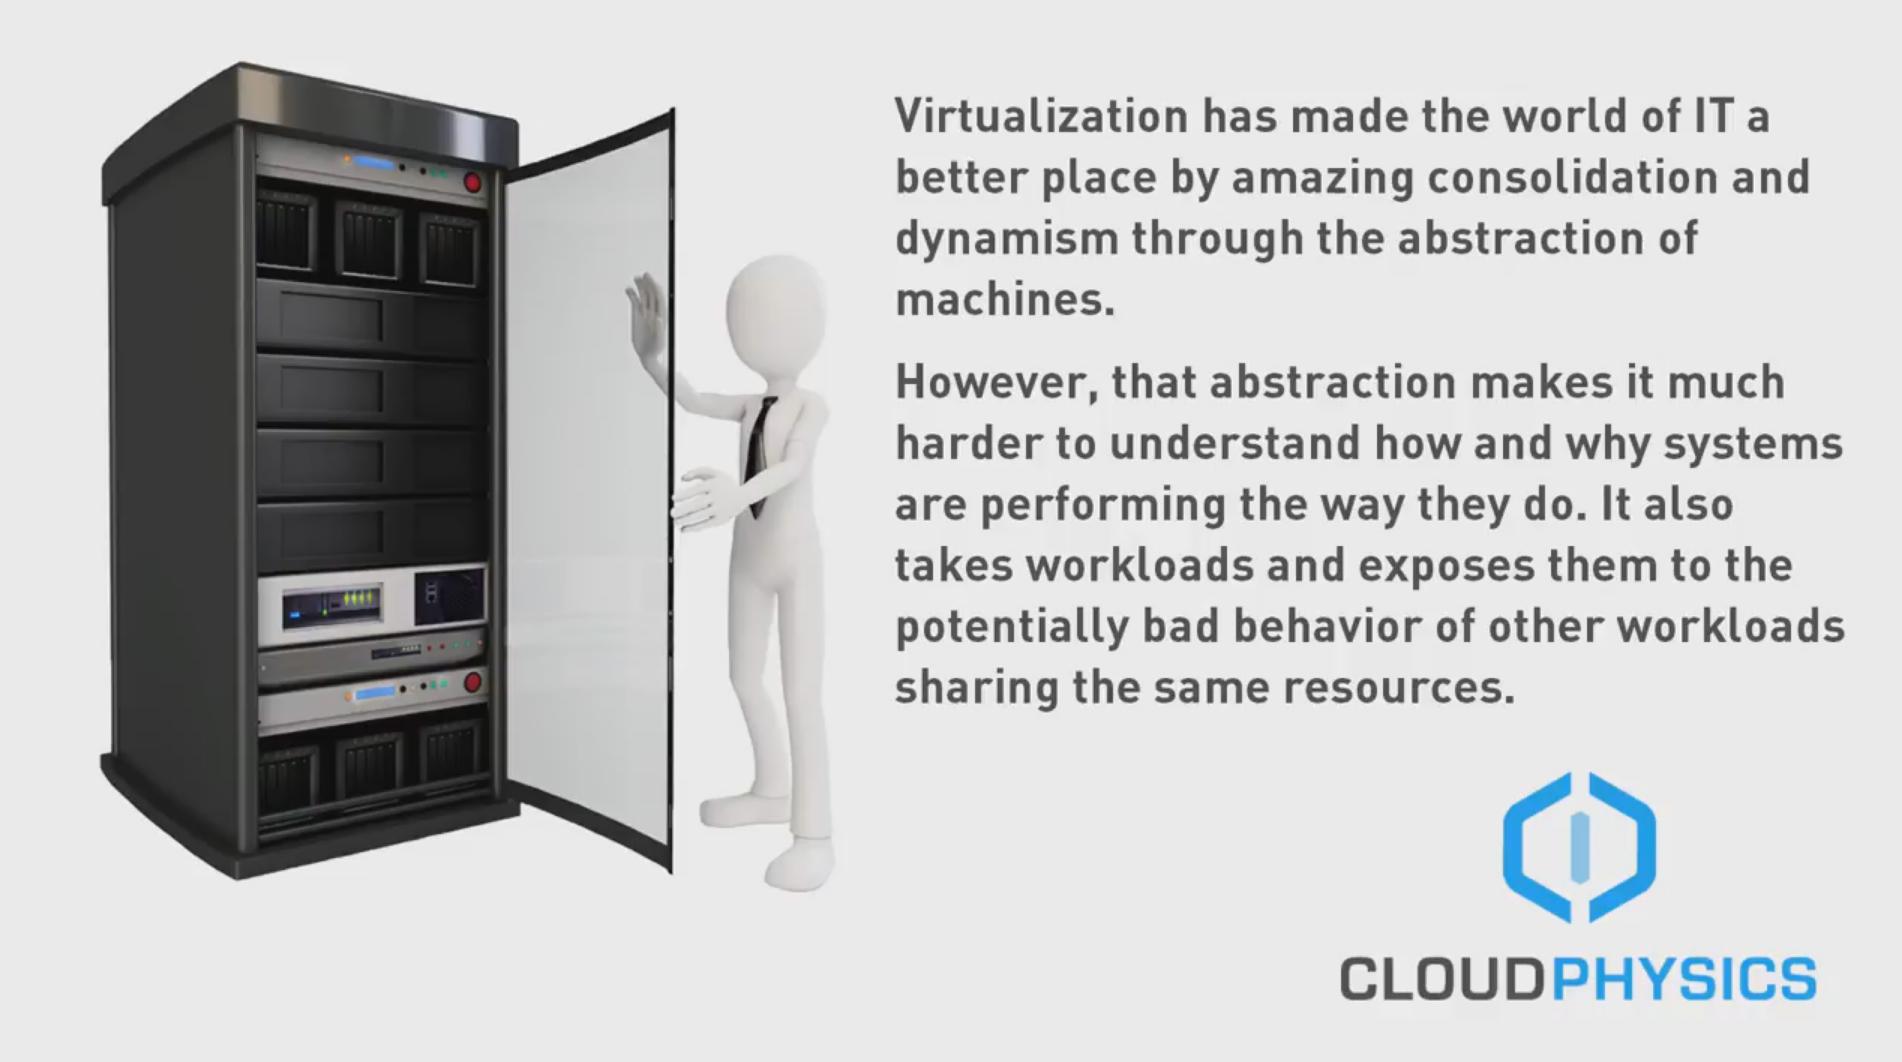 CloudPhysics - Storage Performance Analysis